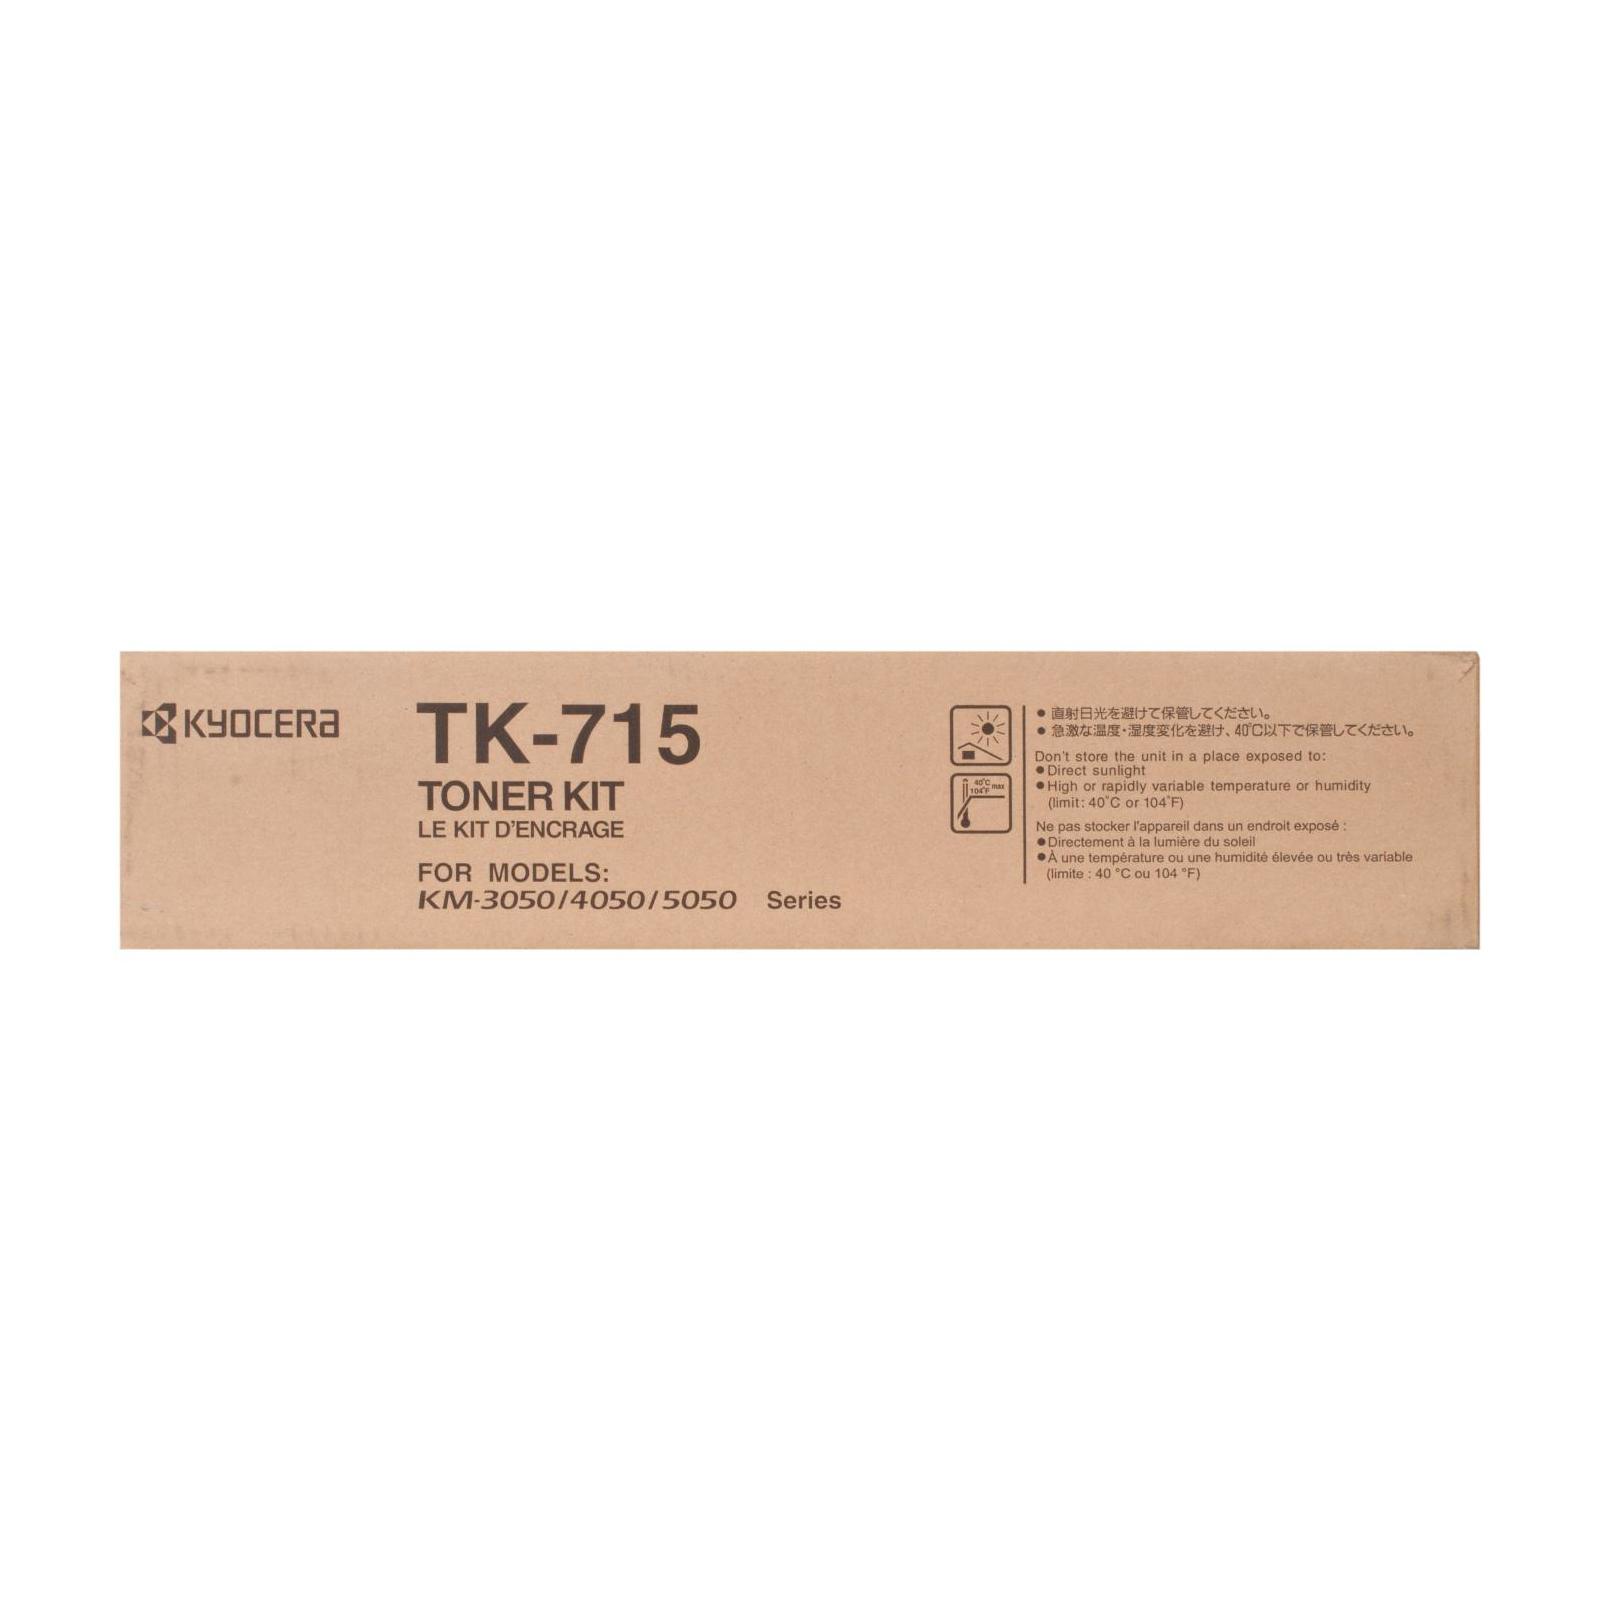 Тонер-картридж Kyocera TK-715 34K (1T02GR0EU0) изображение 5